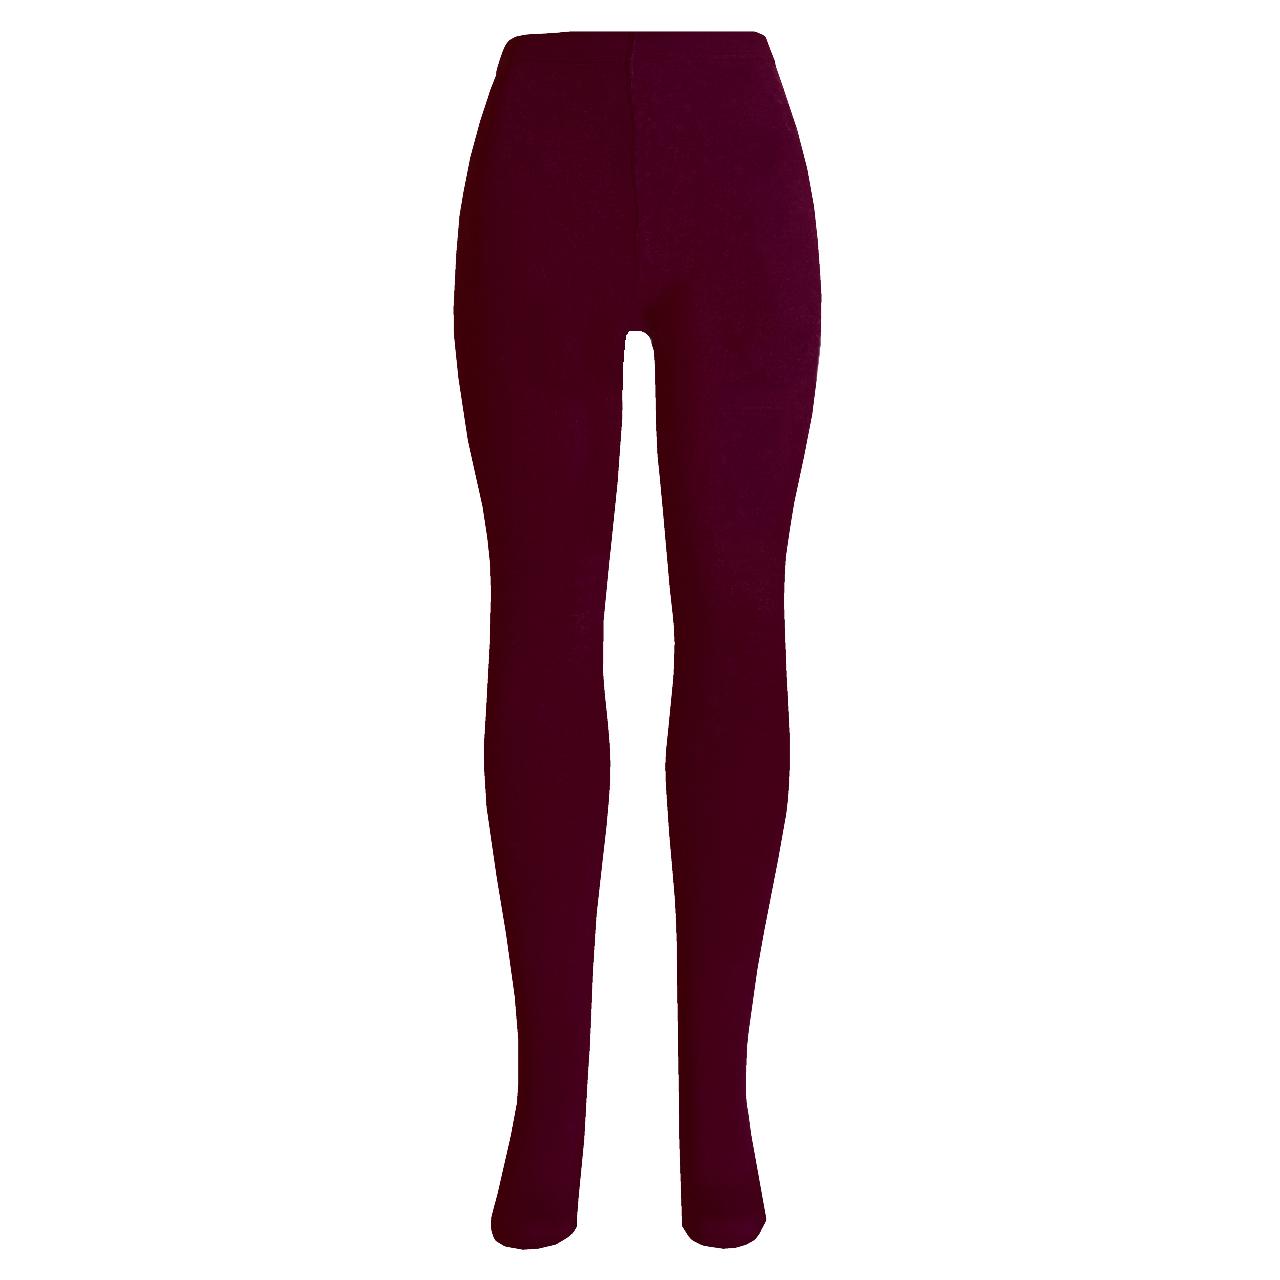 جوراب شلواری زنانه کد 03